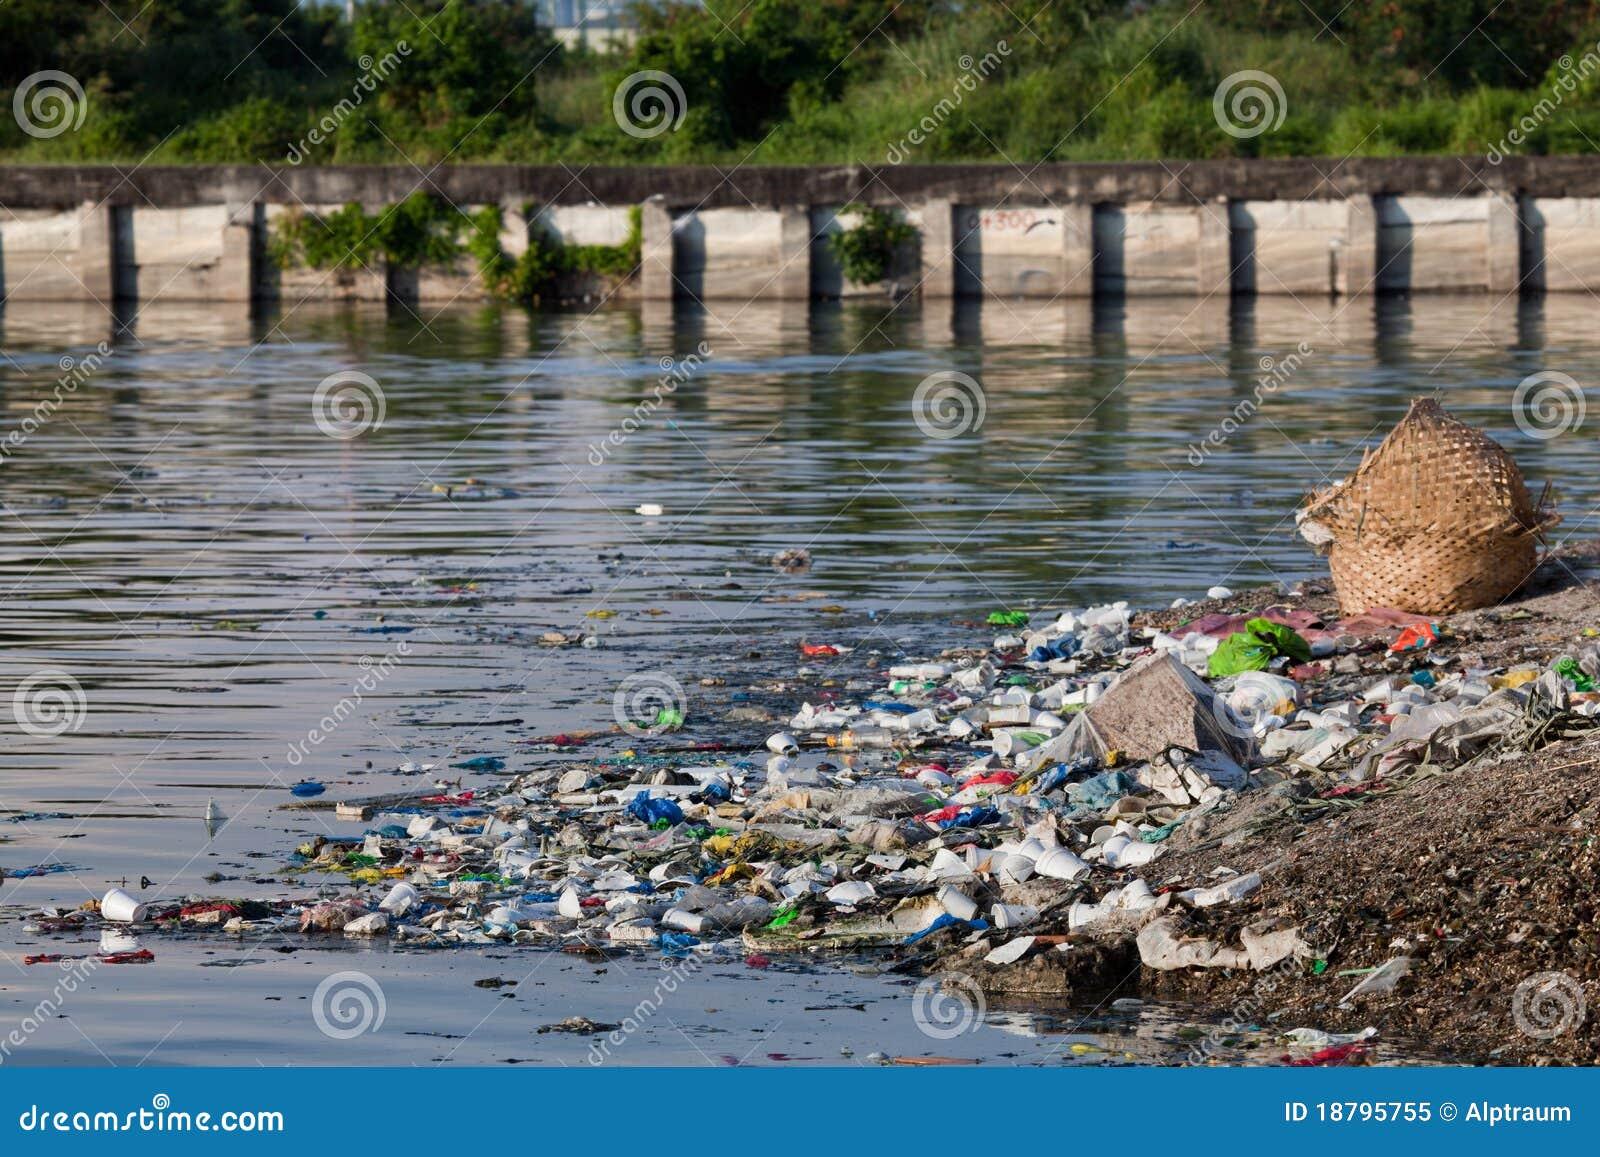 water pollution un hindi essays